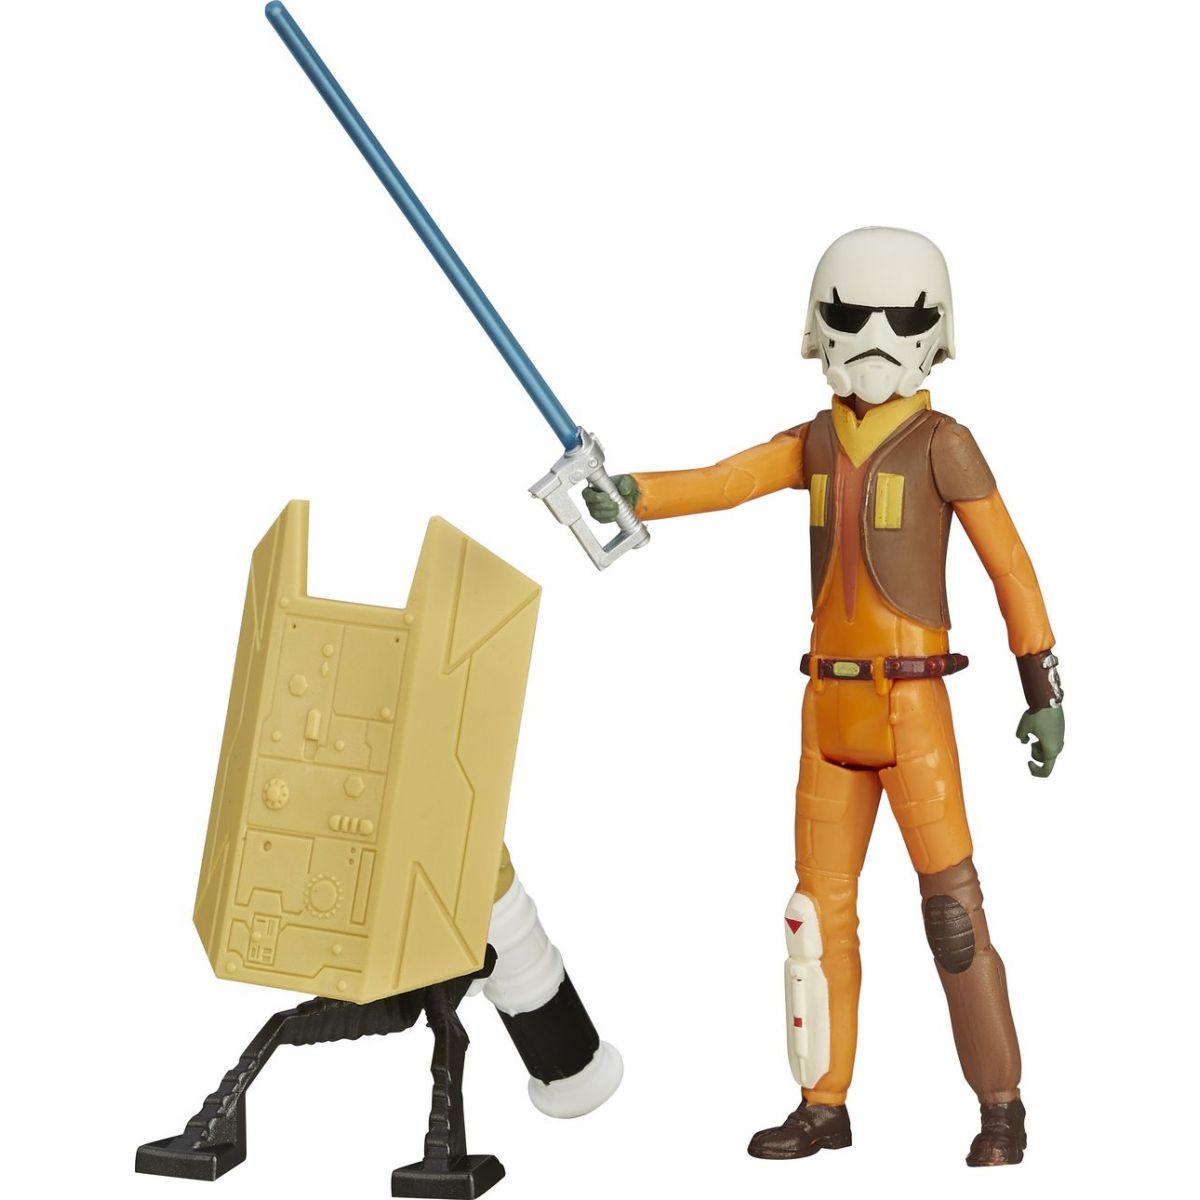 Hasbro Star Wars Epizoda 7 Sněžné figurky - Ezra Bridger